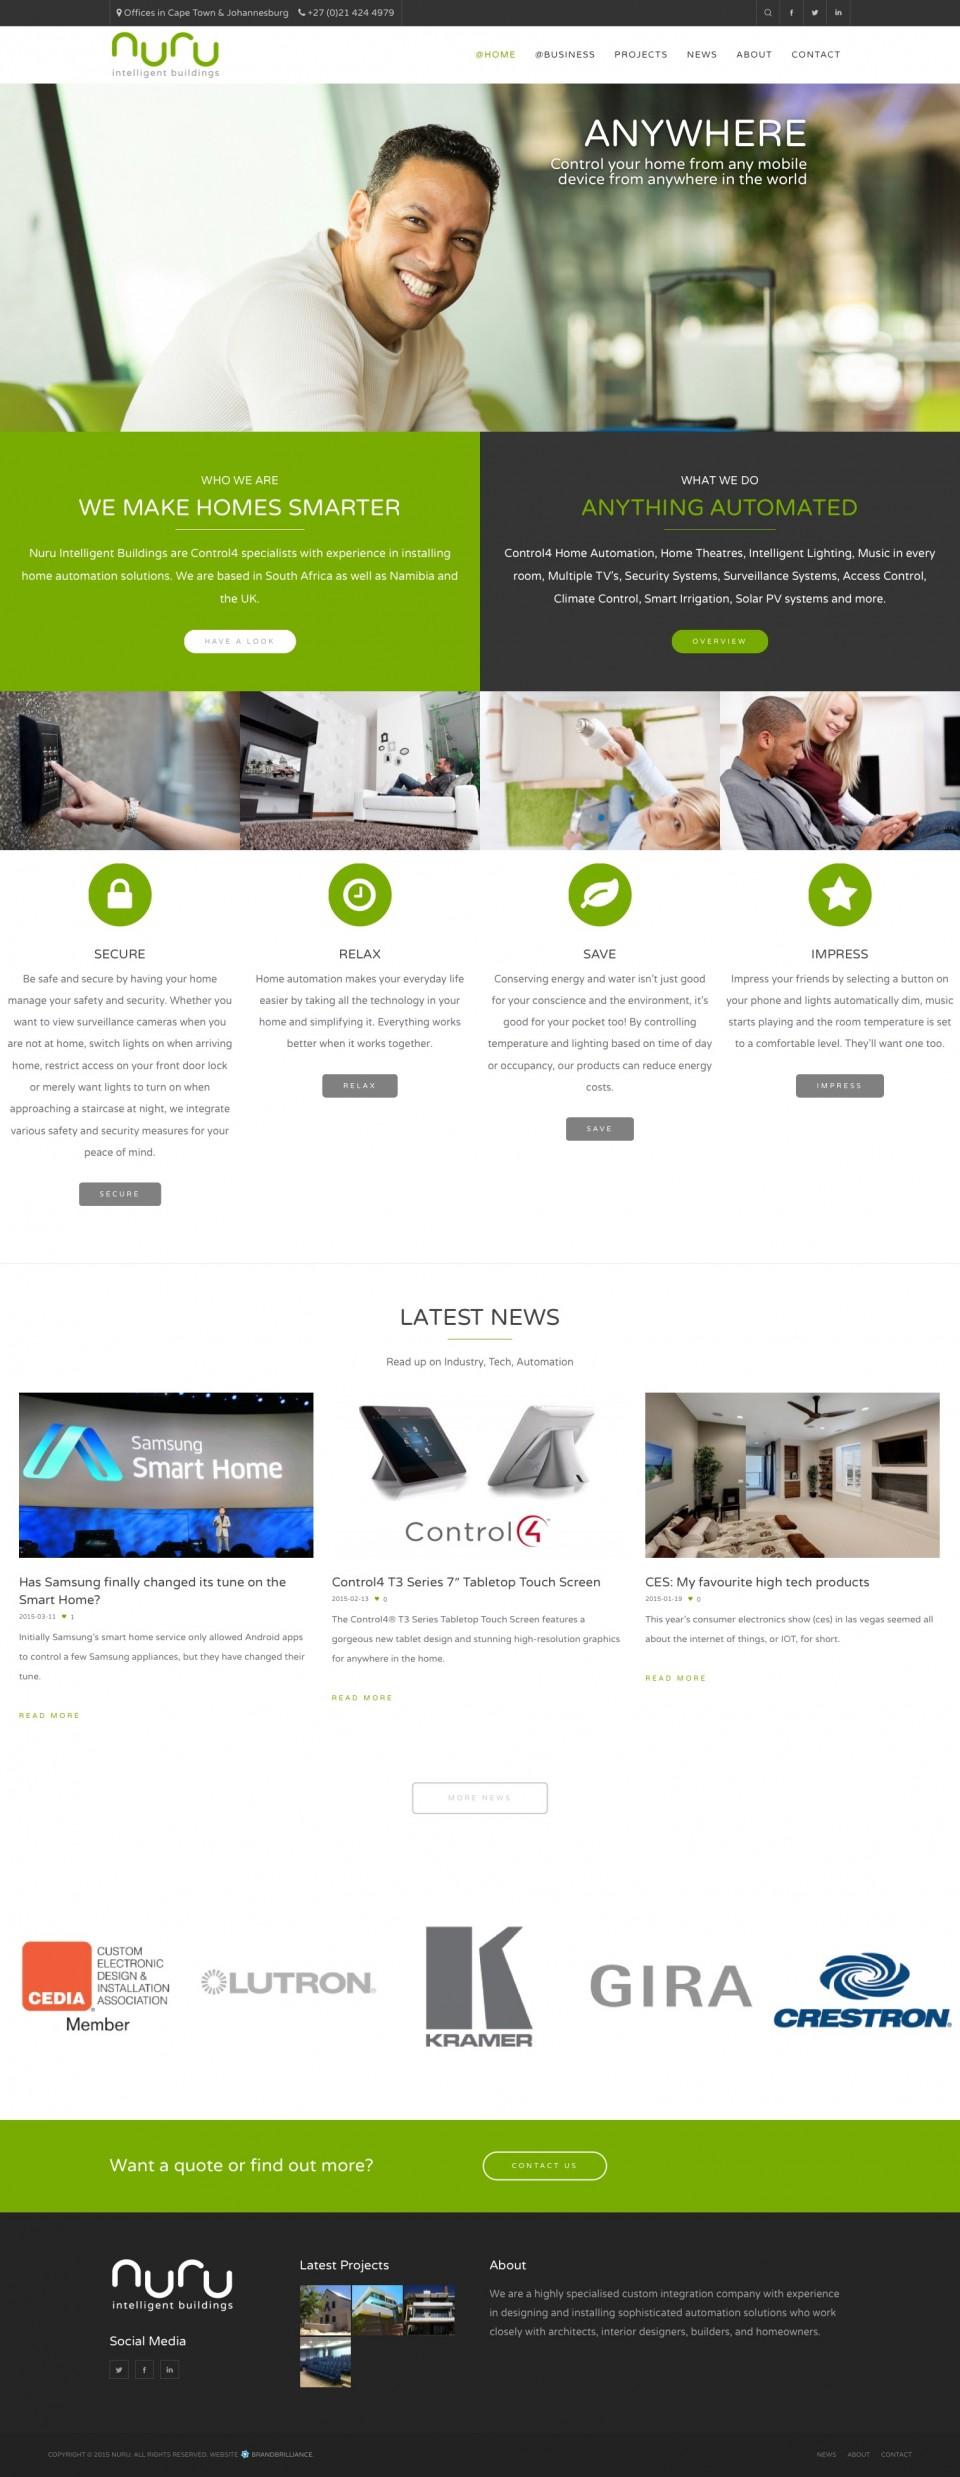 Nuru Website - Home